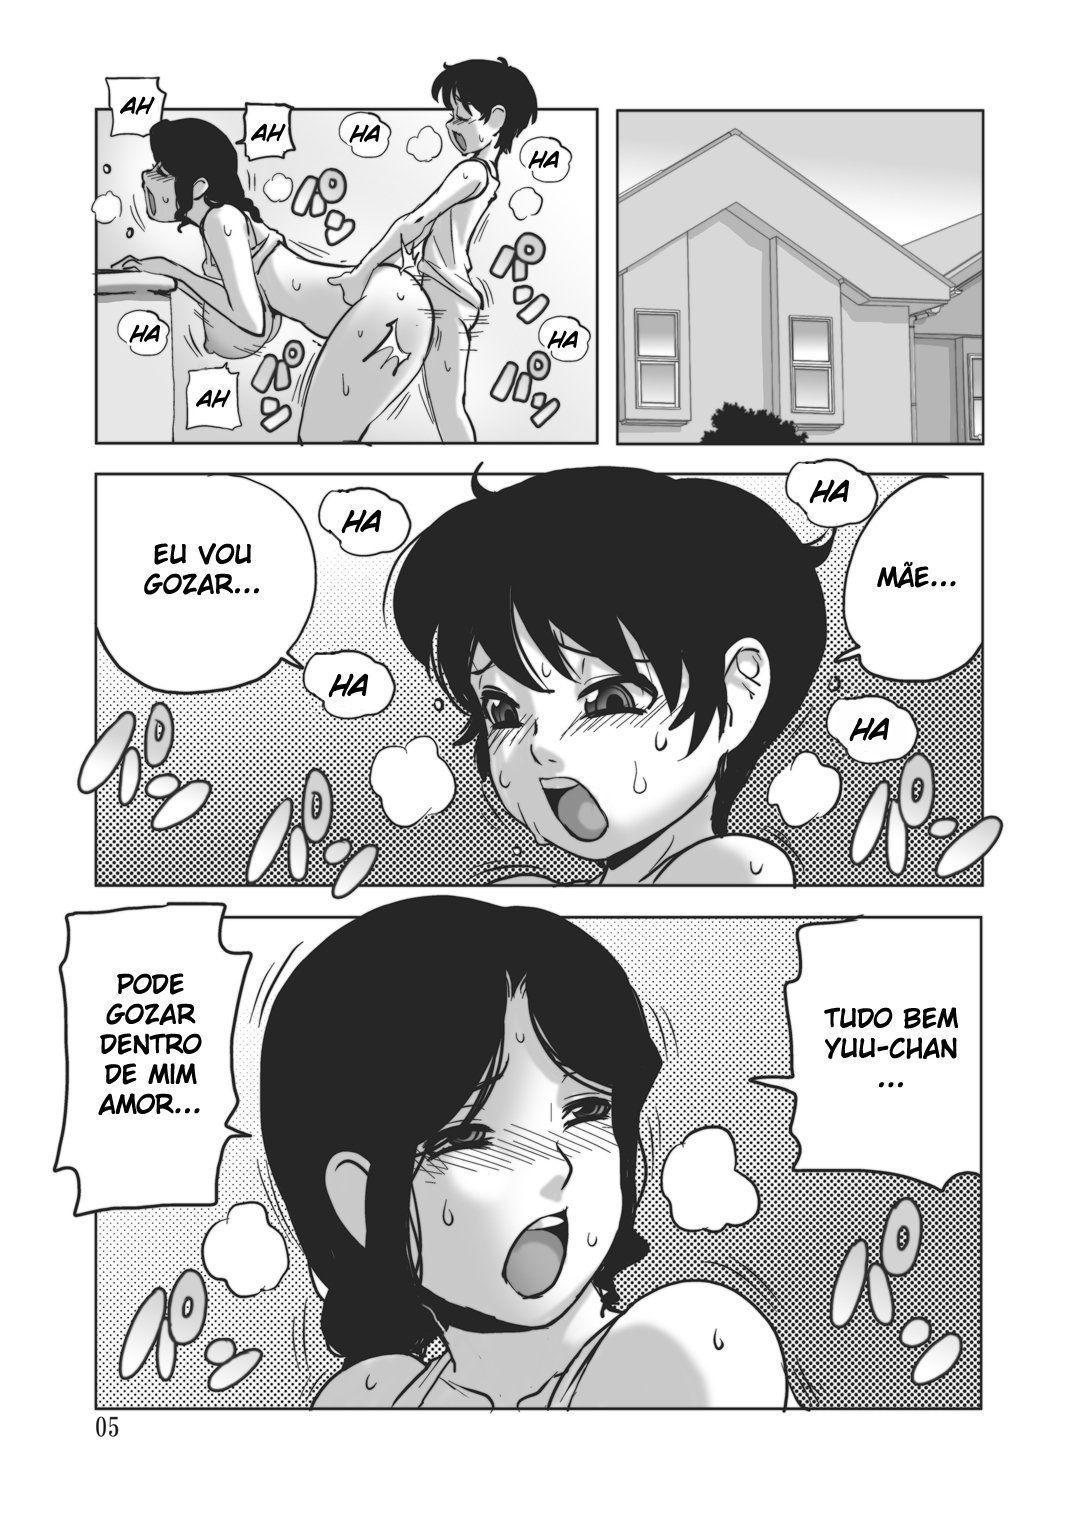 Hentaihome-Fodendo-minha-mãe-2